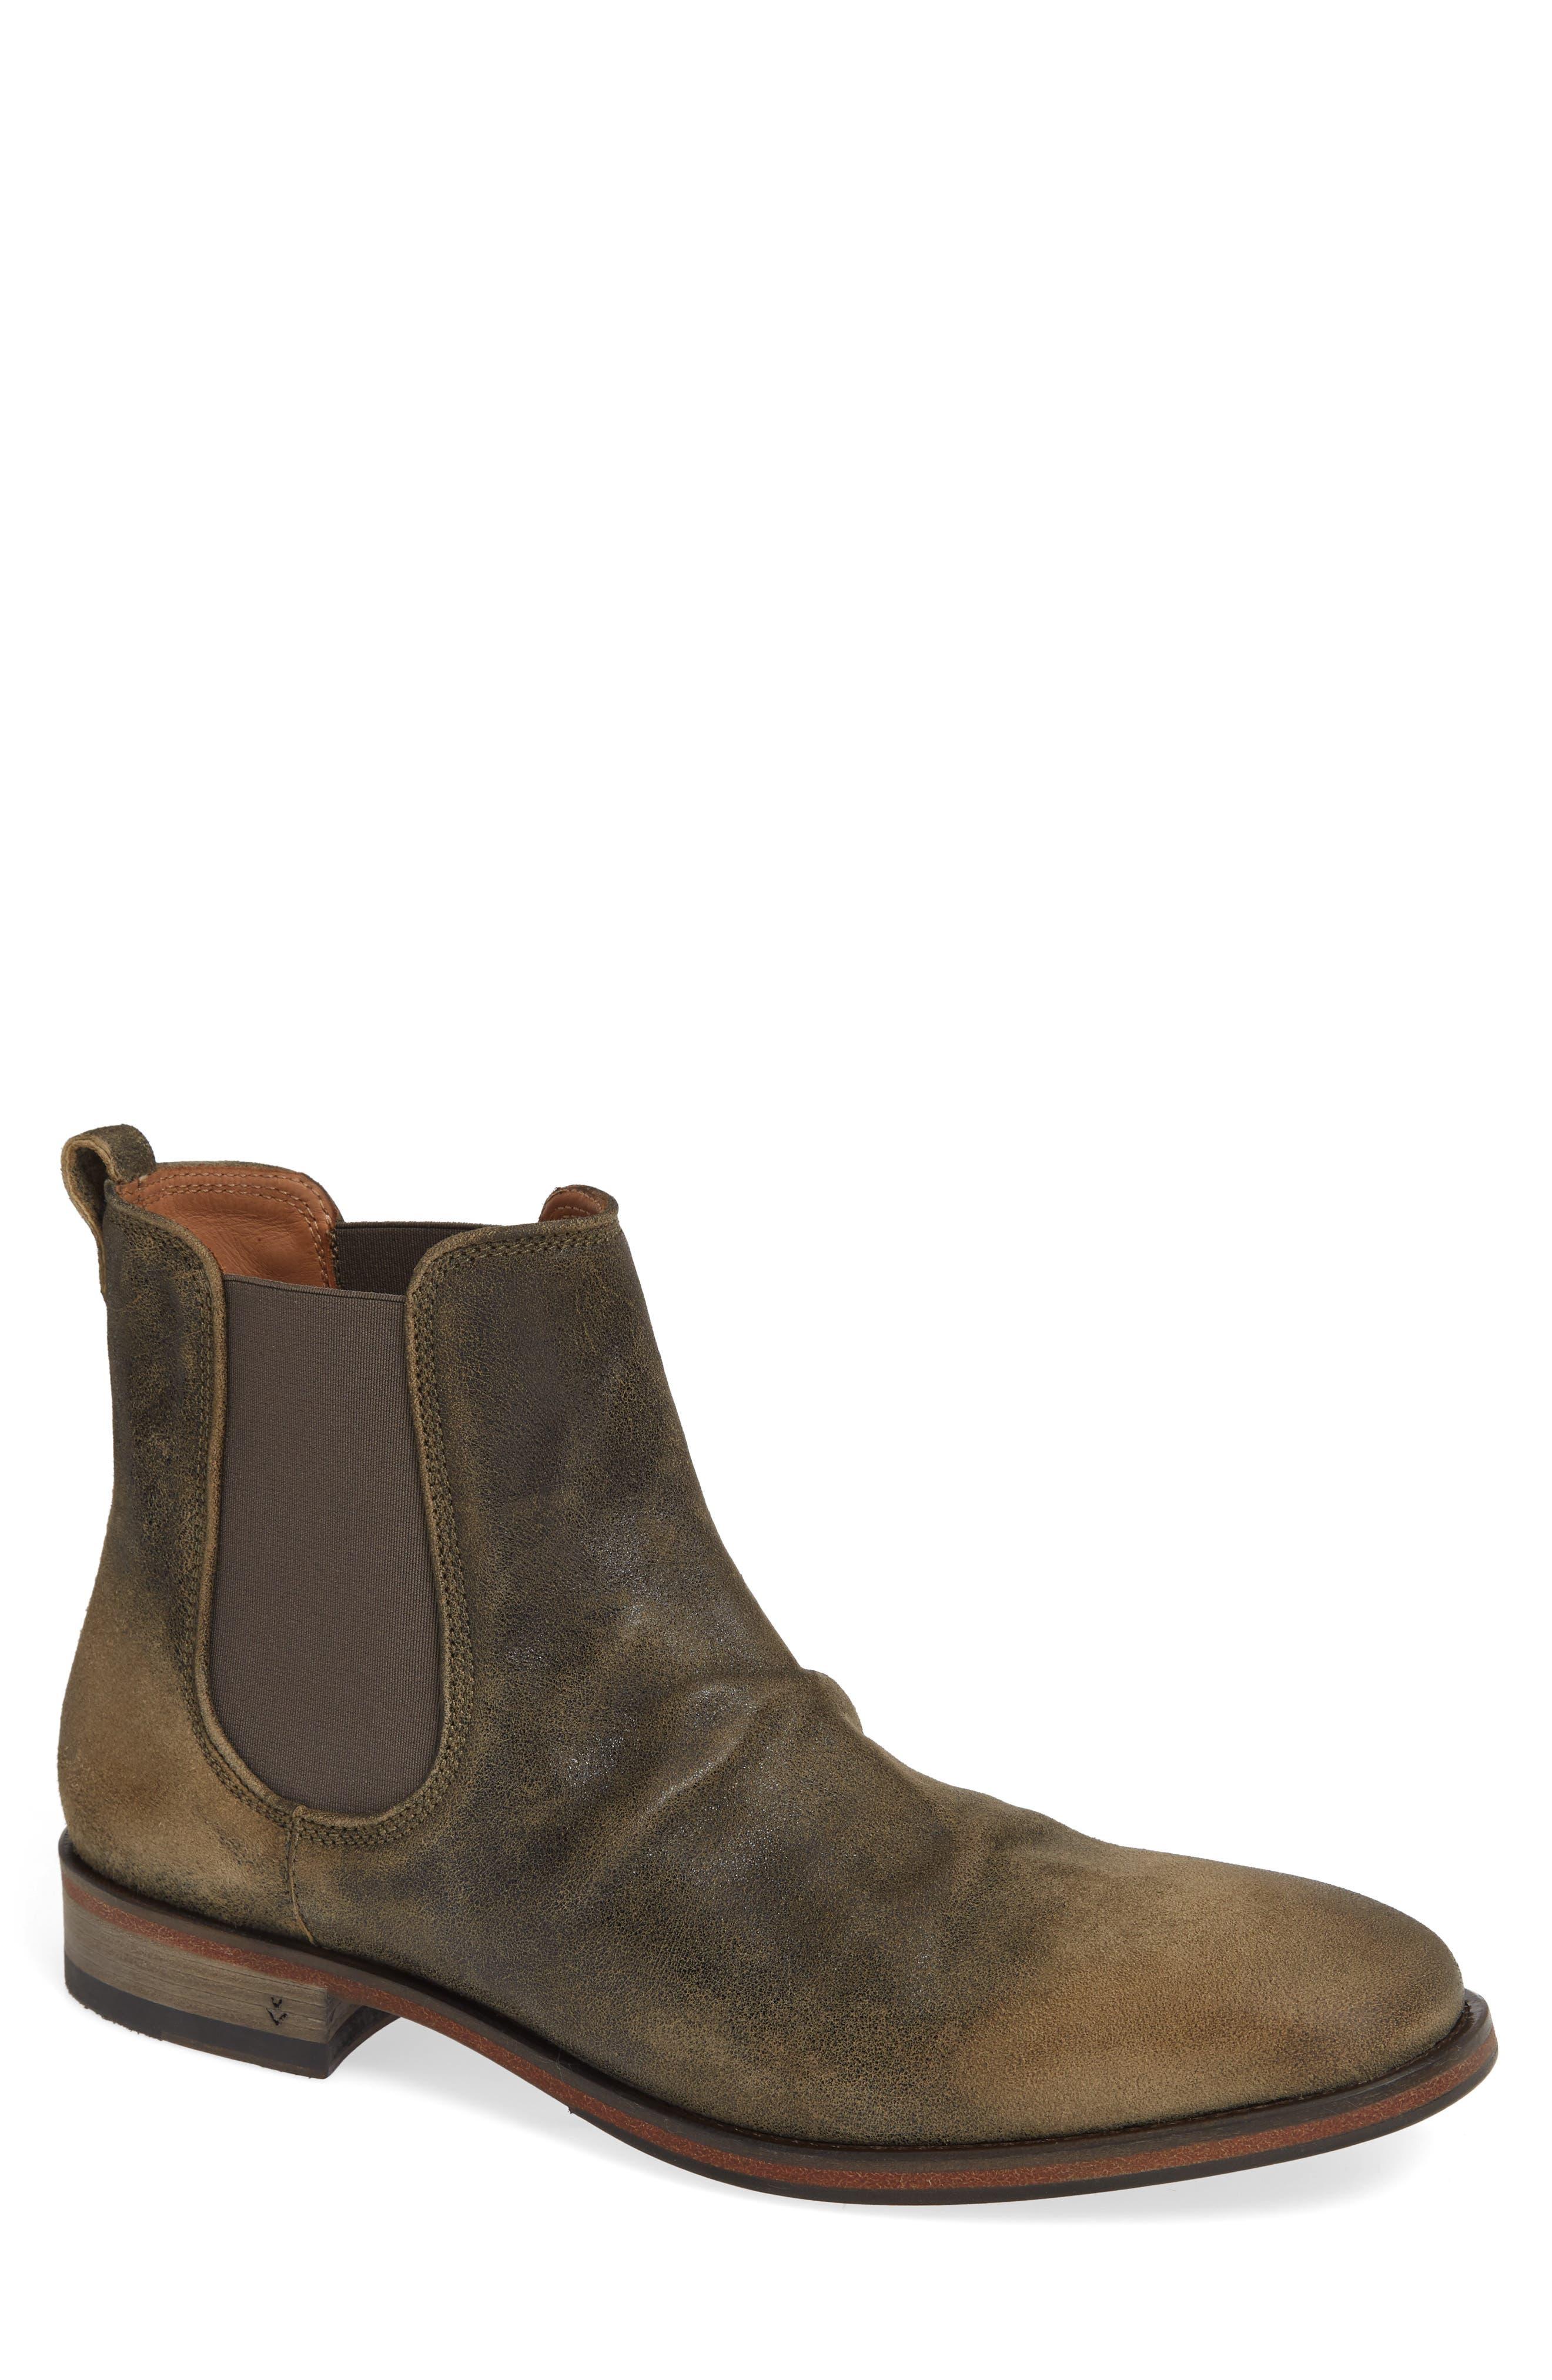 John Varvatos Collection Fleetwood Chelsea Boot